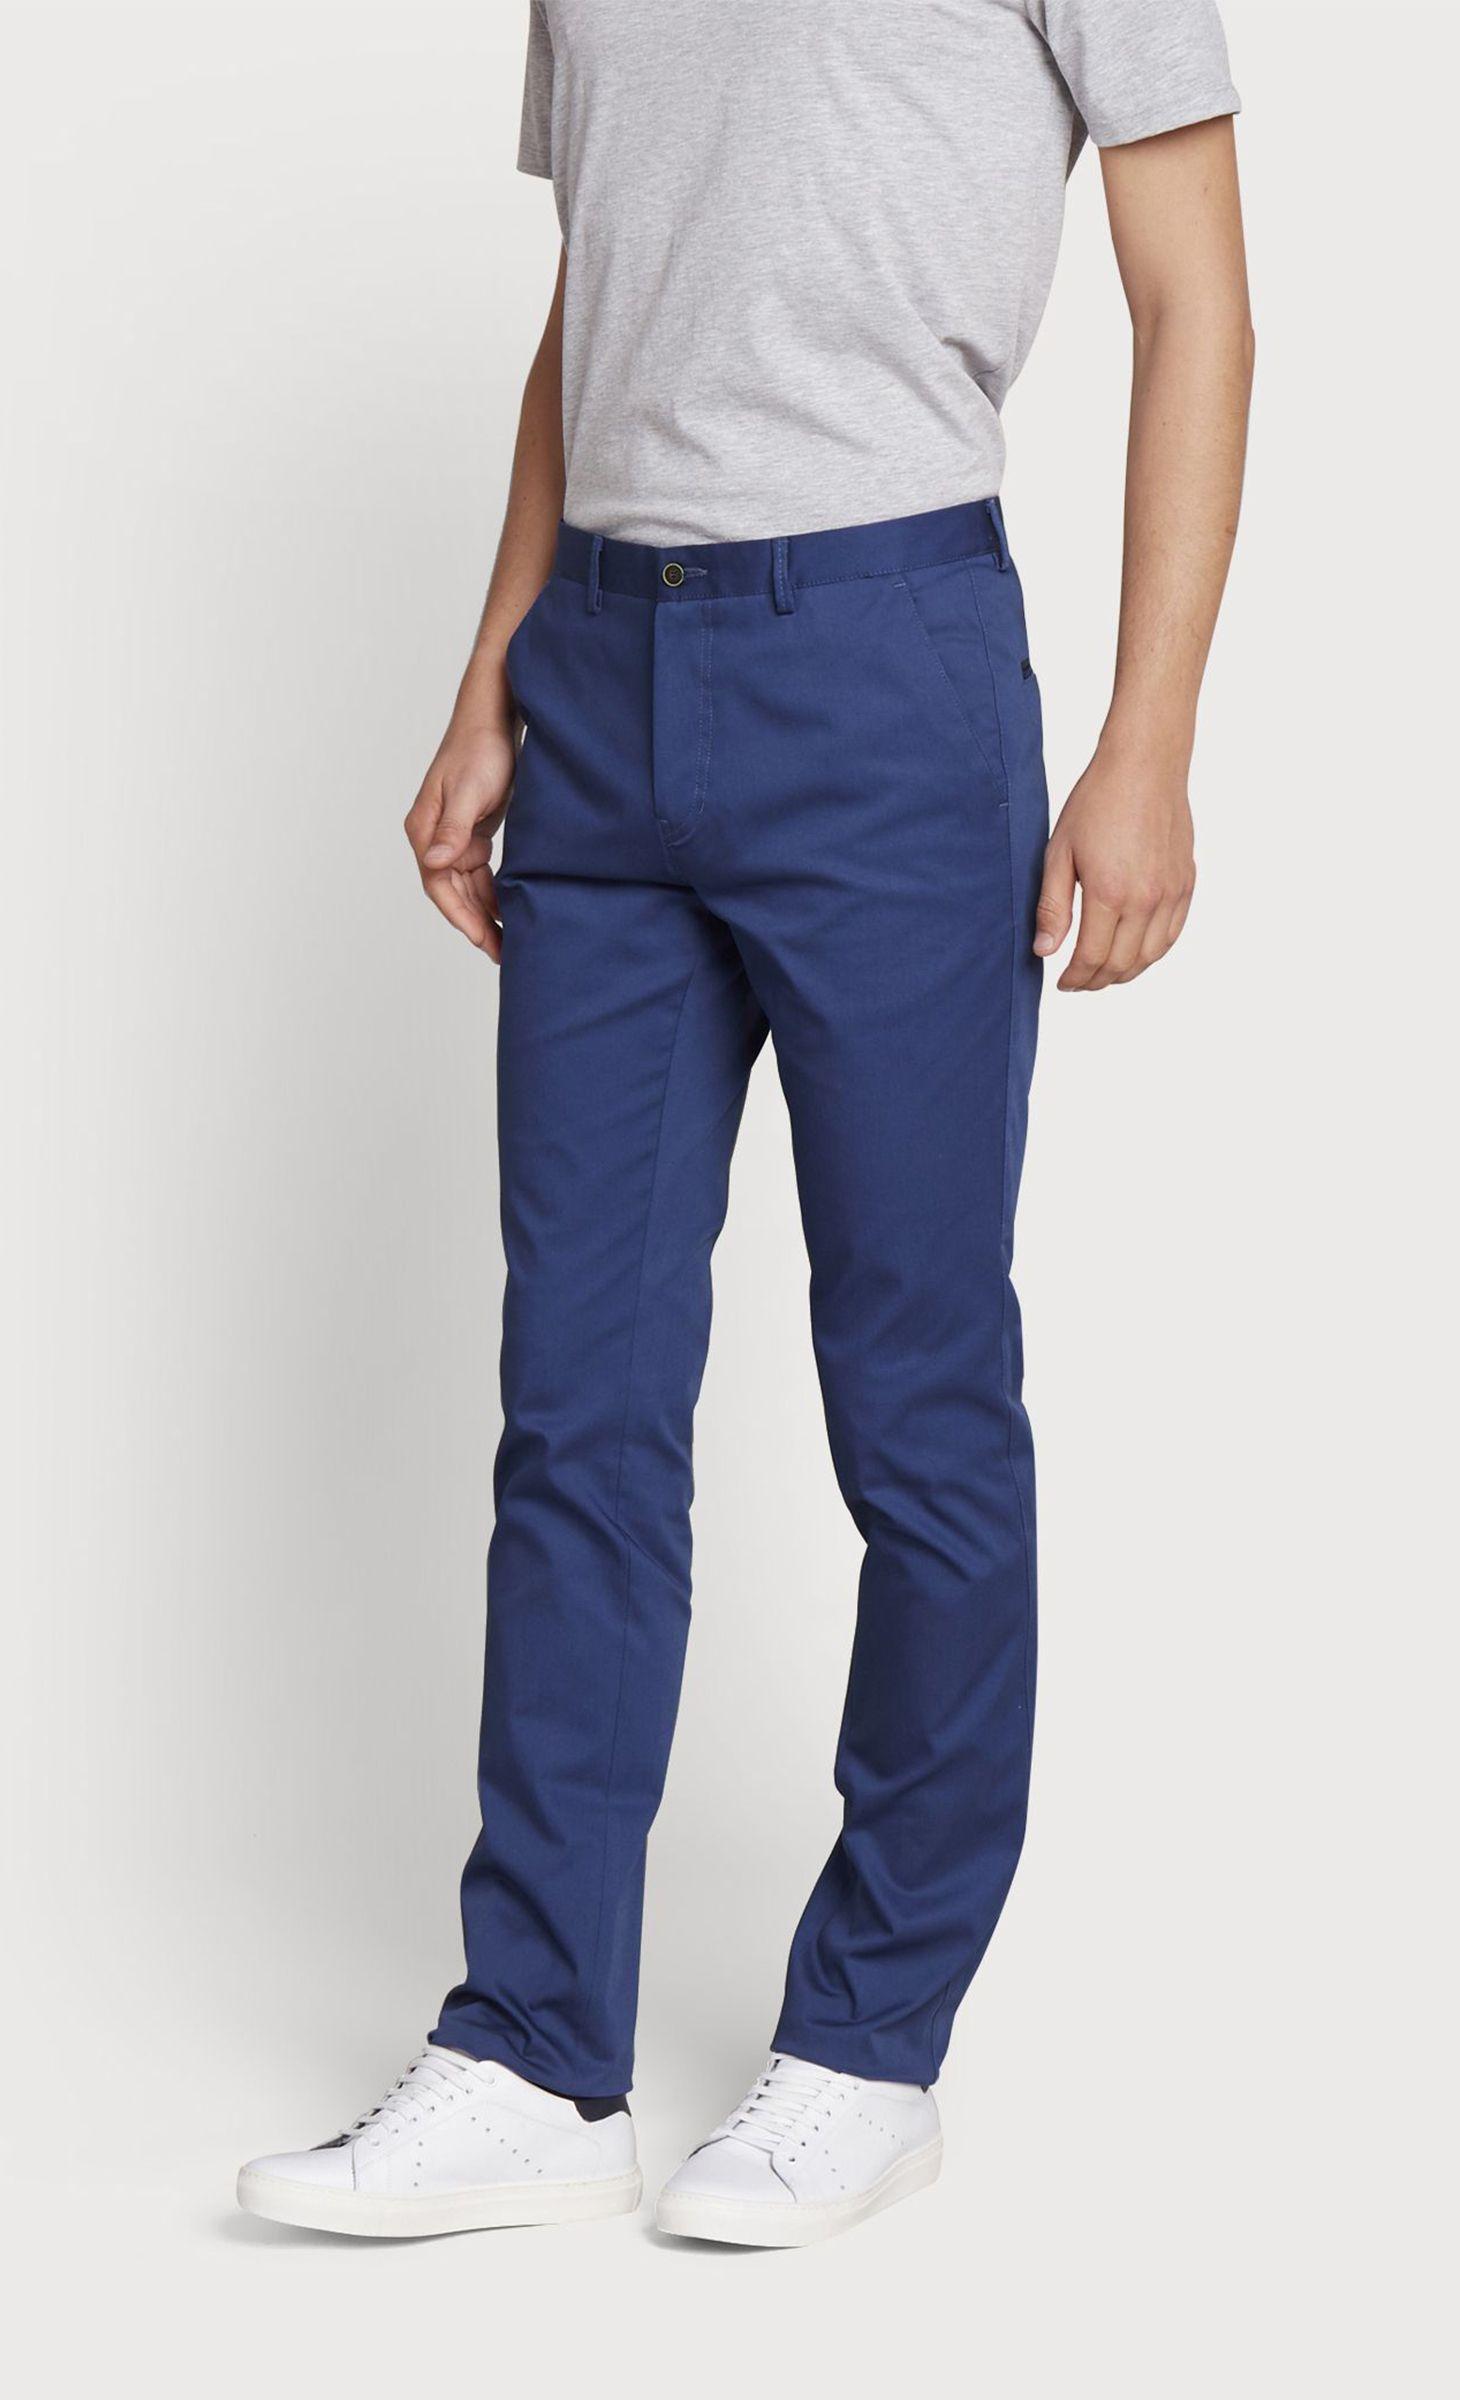 Pantalon slack bleu saphir coupe ajustée